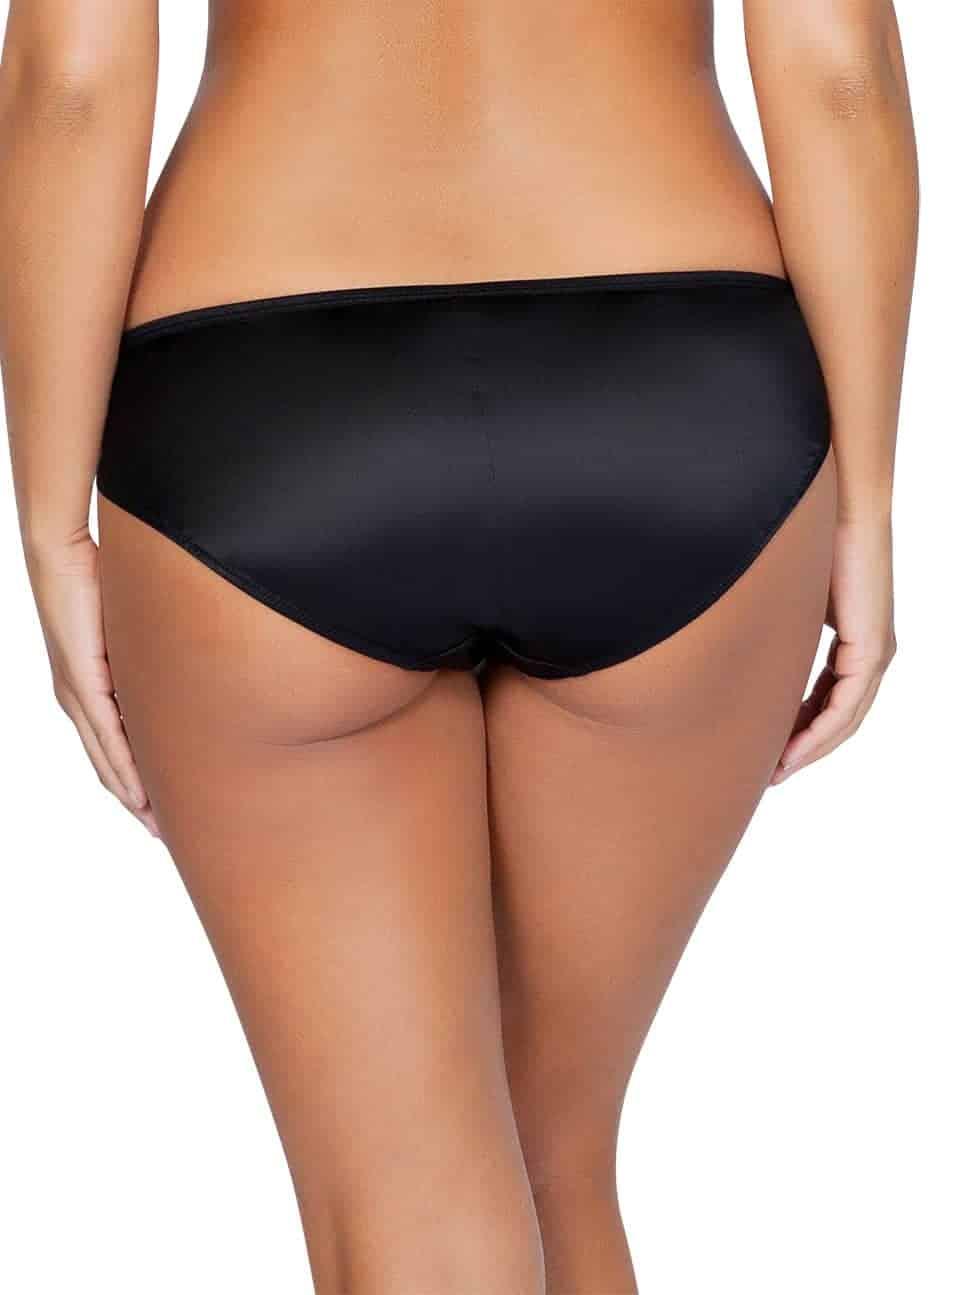 Charlotte Bikini6905 Black Back - Charlotte Bikini - Black - 6905